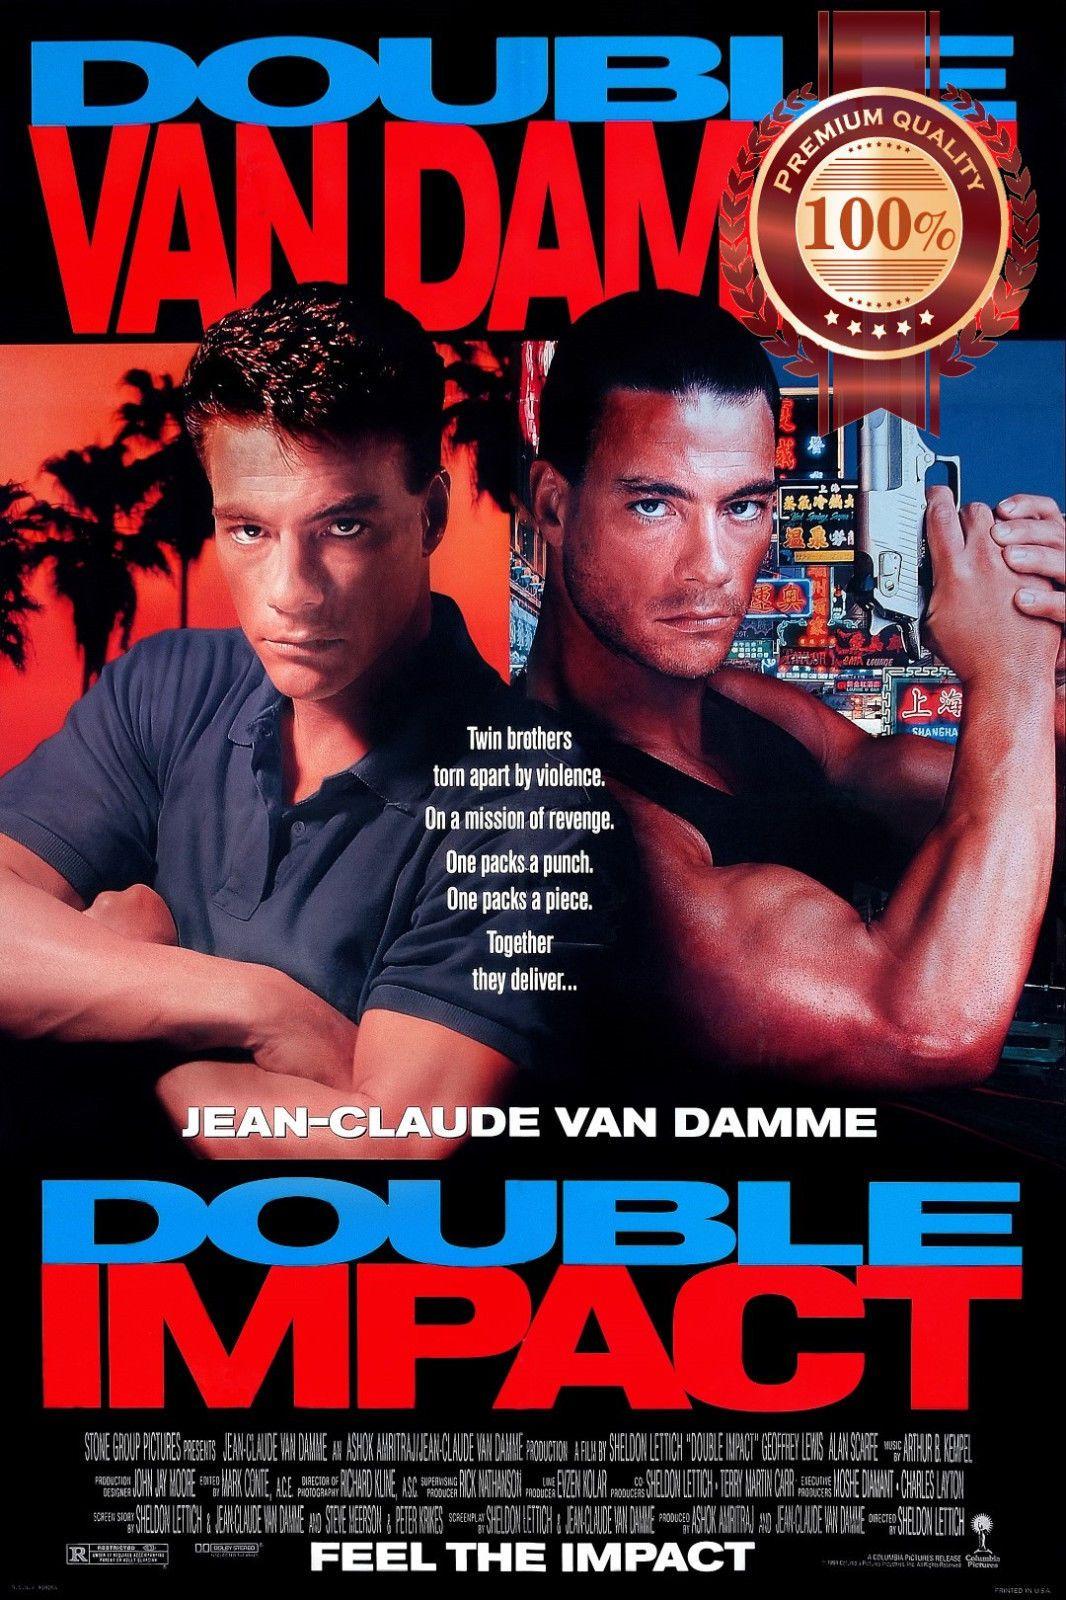 11 95 Aud Double Impact Van Damme Movie Film 1991 90s Original